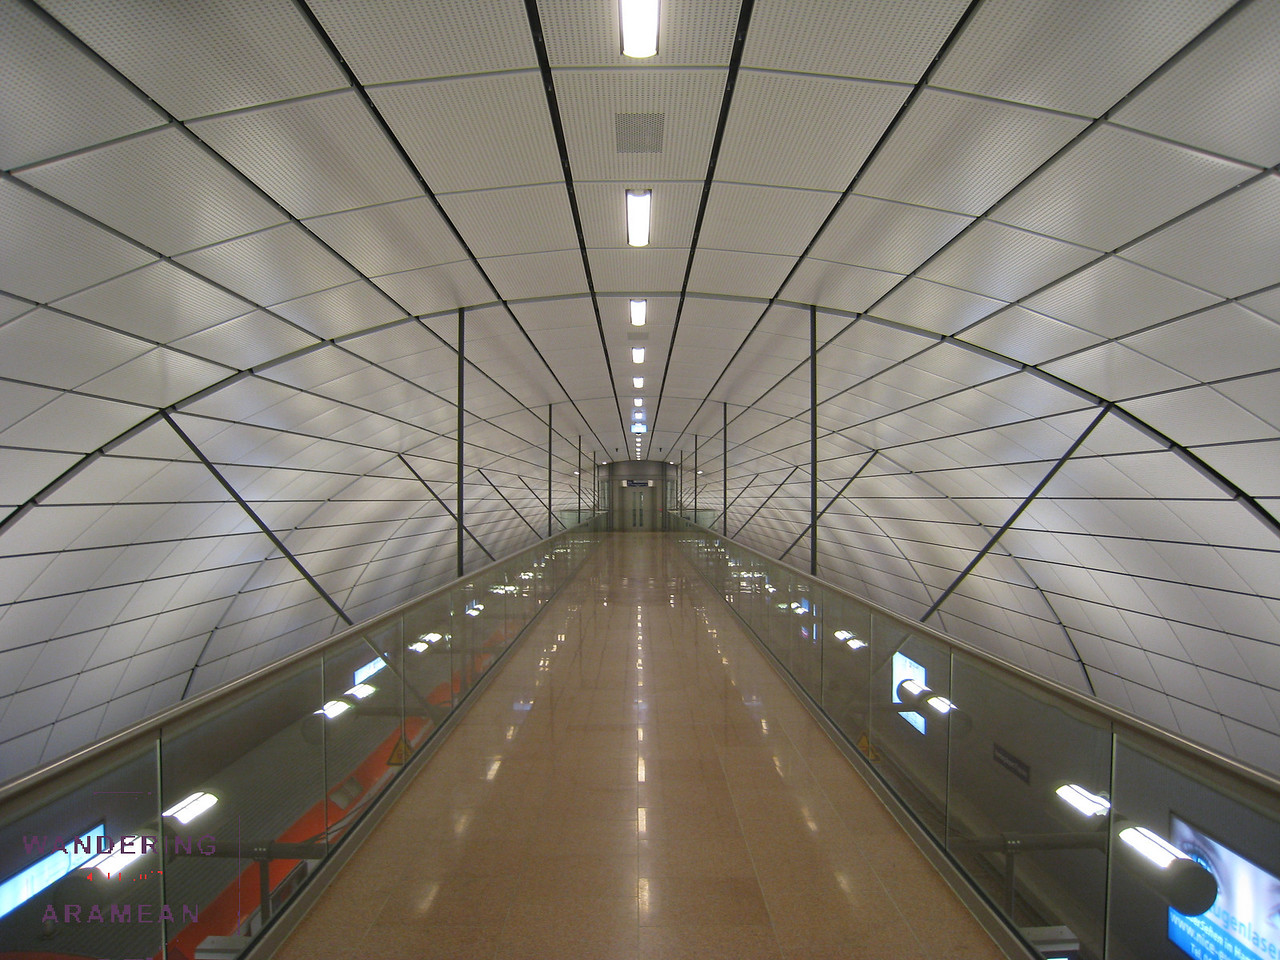 The S-bahn station at Hamburg airport